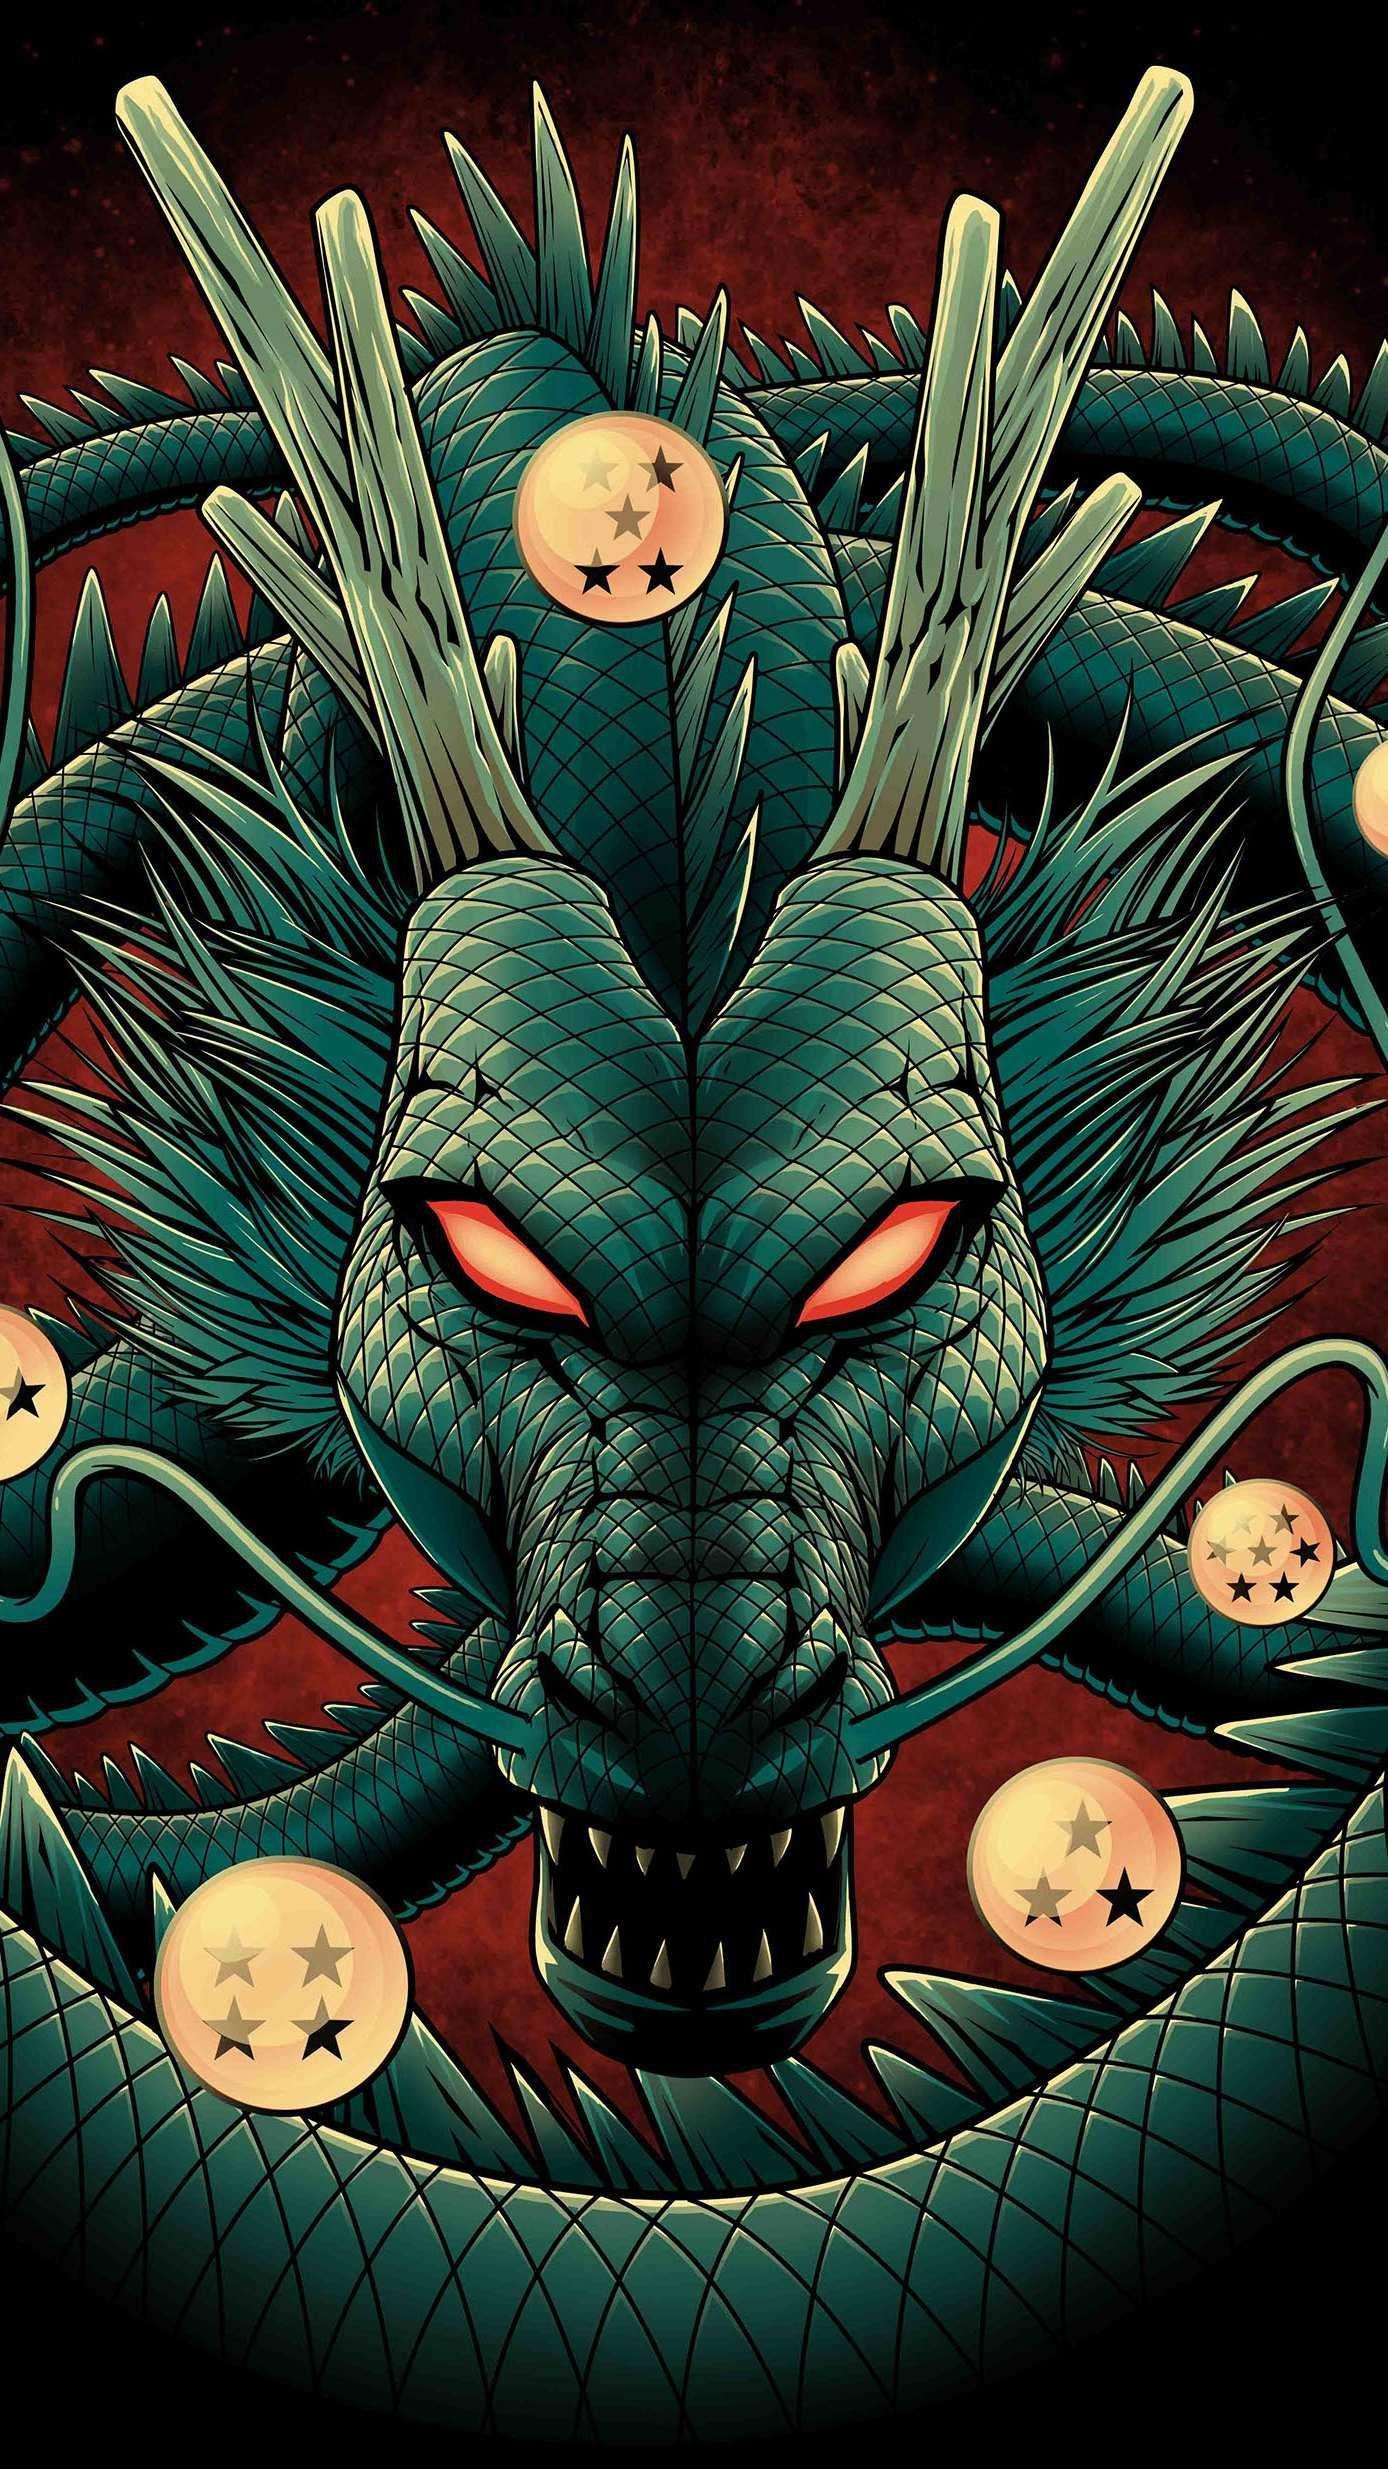 Dragon Ball Super 4k iPhone Wallpapers - Wallpaper Cave